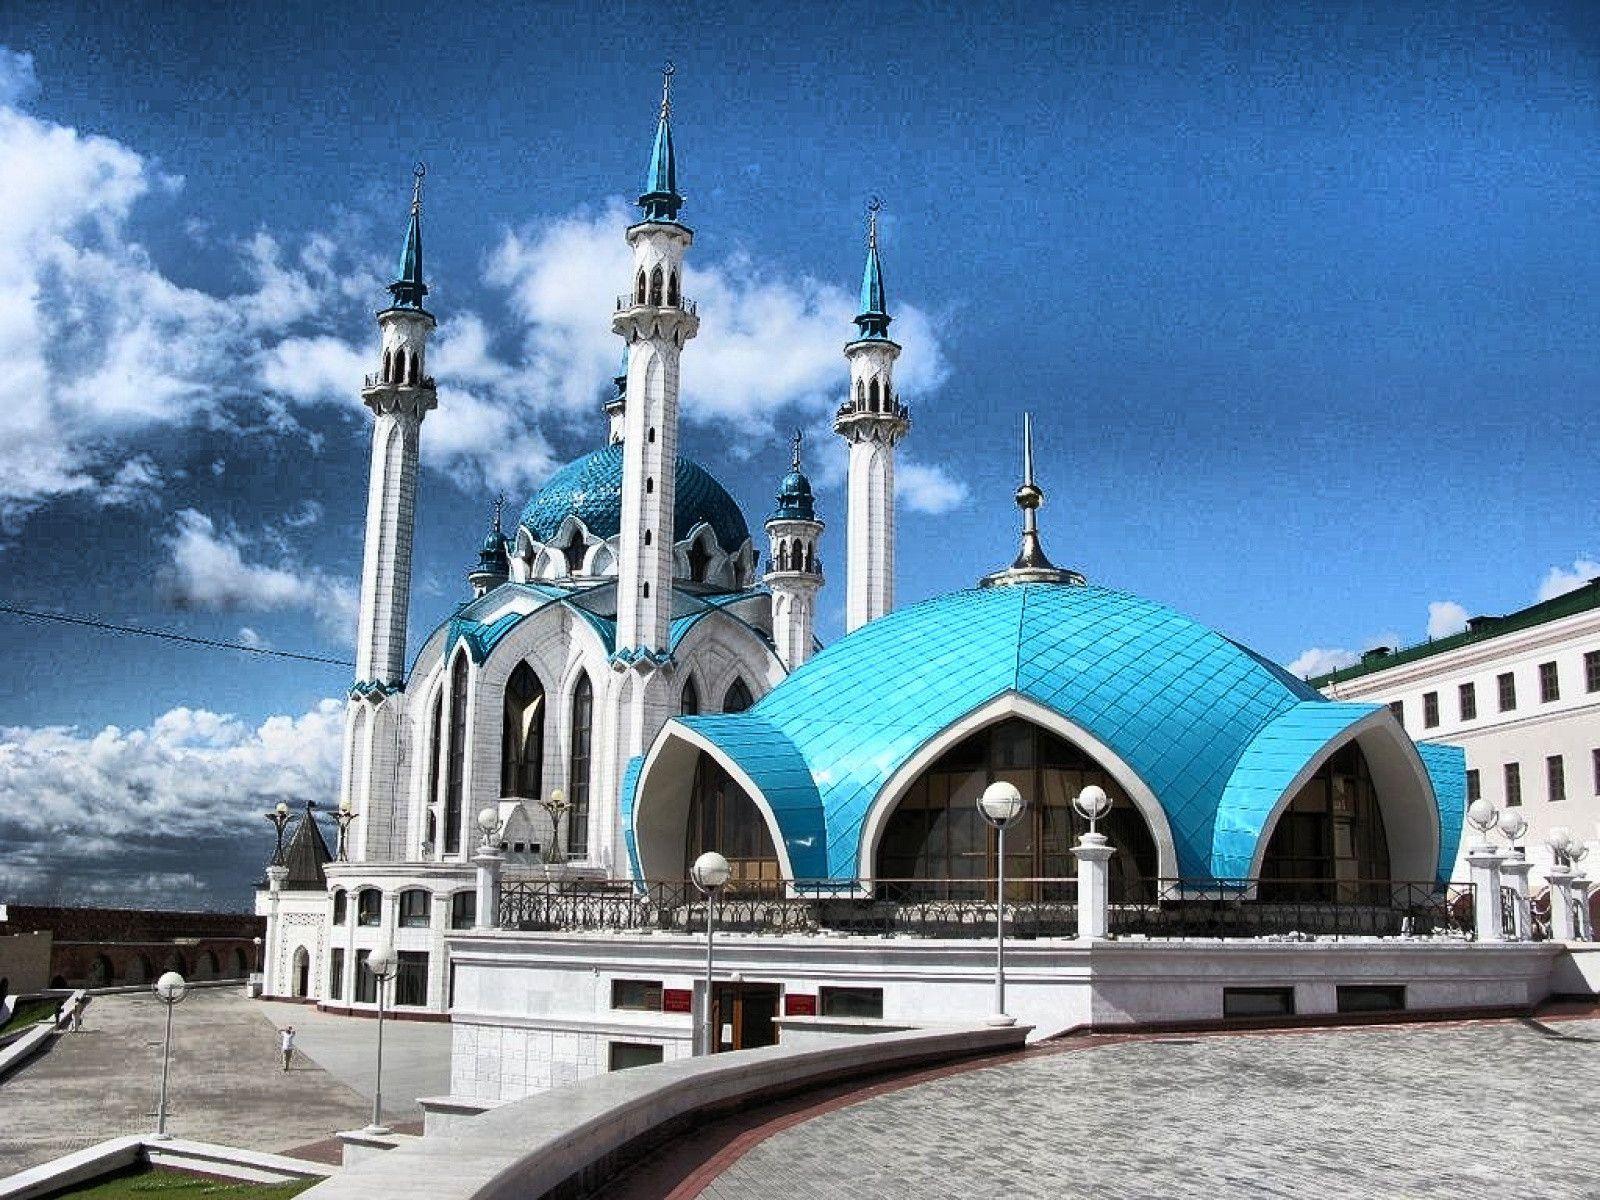 Download World Beautiful Mosque Wallpaper Gallery Beautiful Mosques Mosque Mosque Architecture